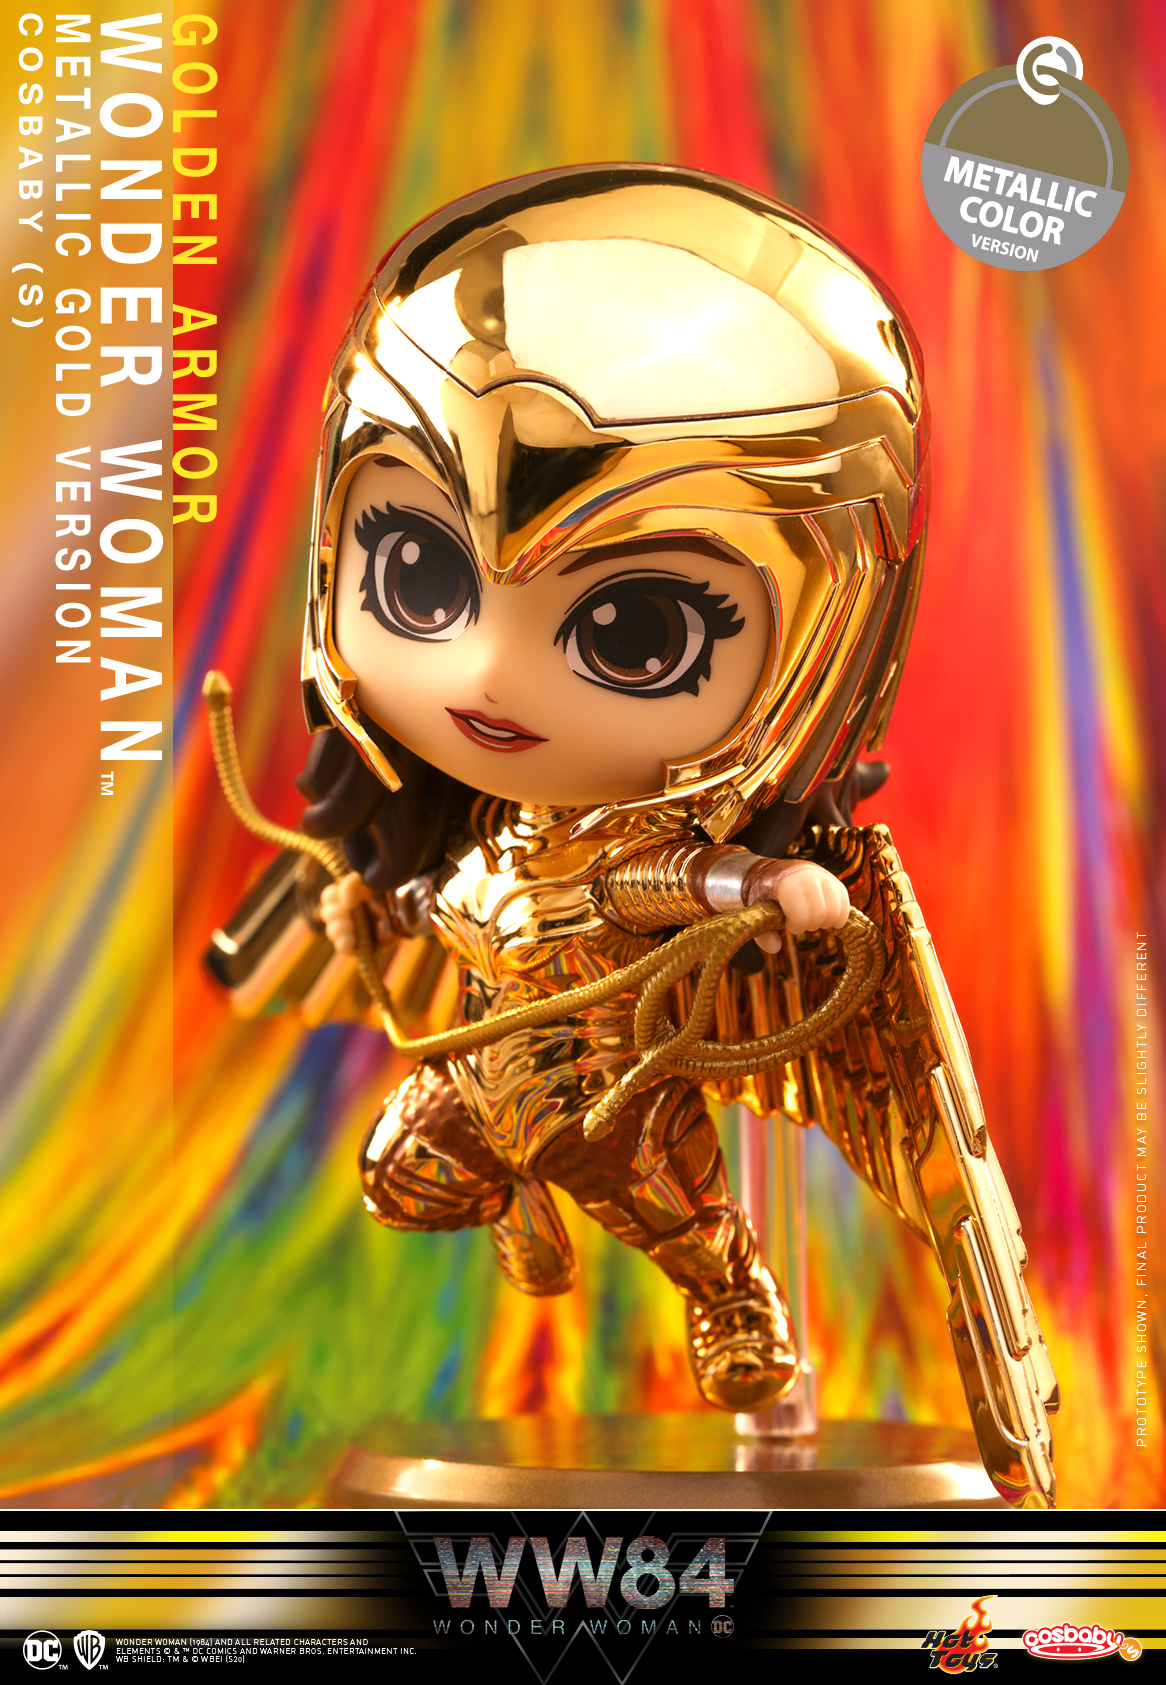 Hot Toys - WW84 - Golden Armor Wonder Woman (Metallic Colour Version) Cosbaby_PR1